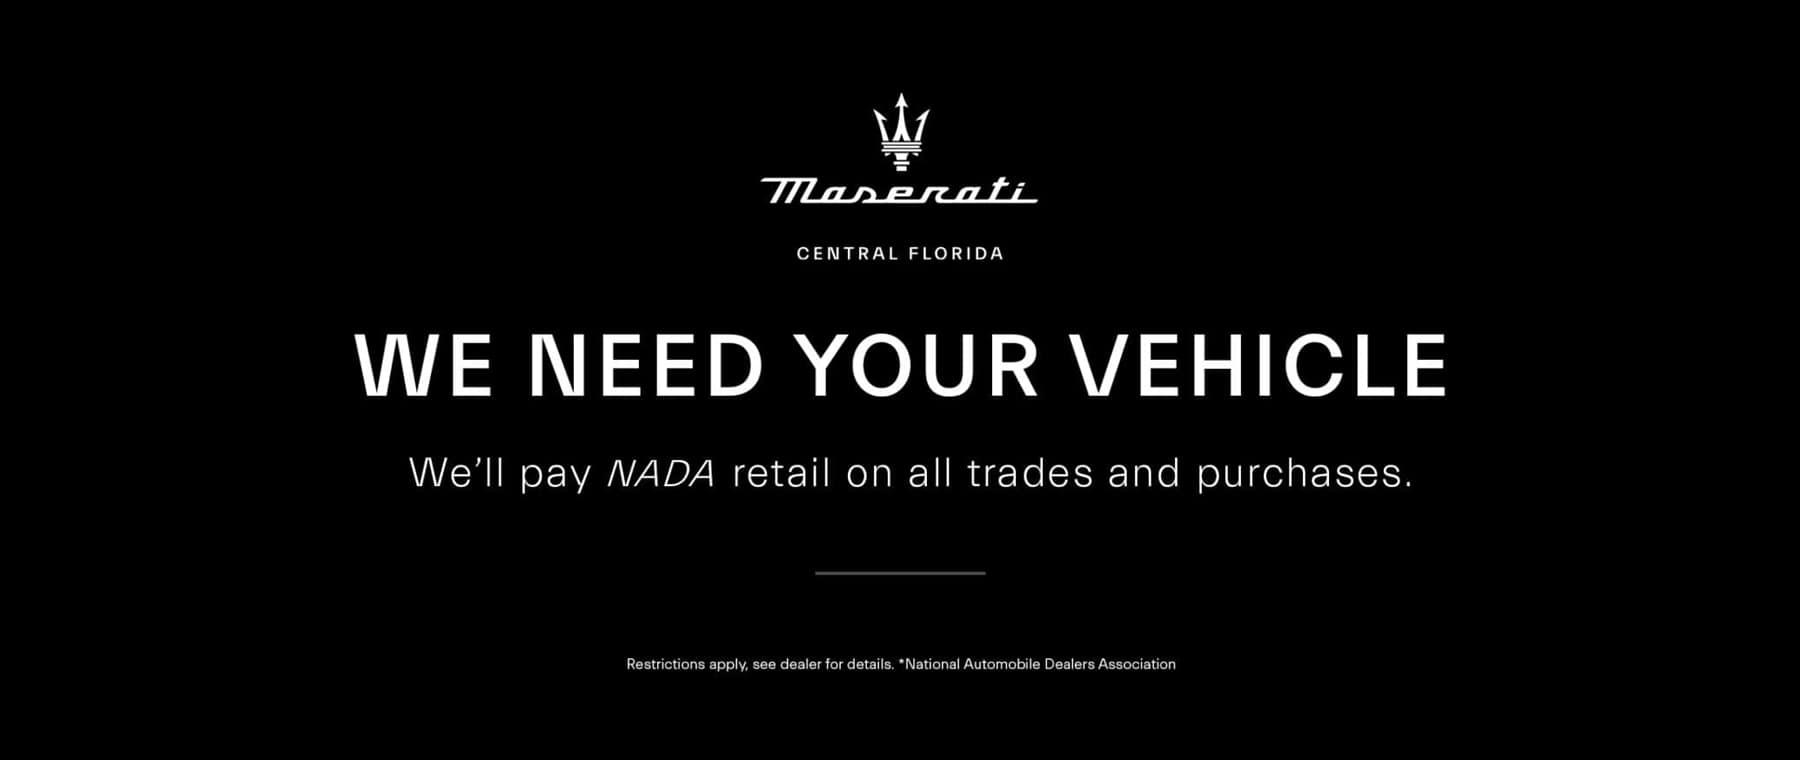 Maserati_Website_Banner_2-1800x760_New2